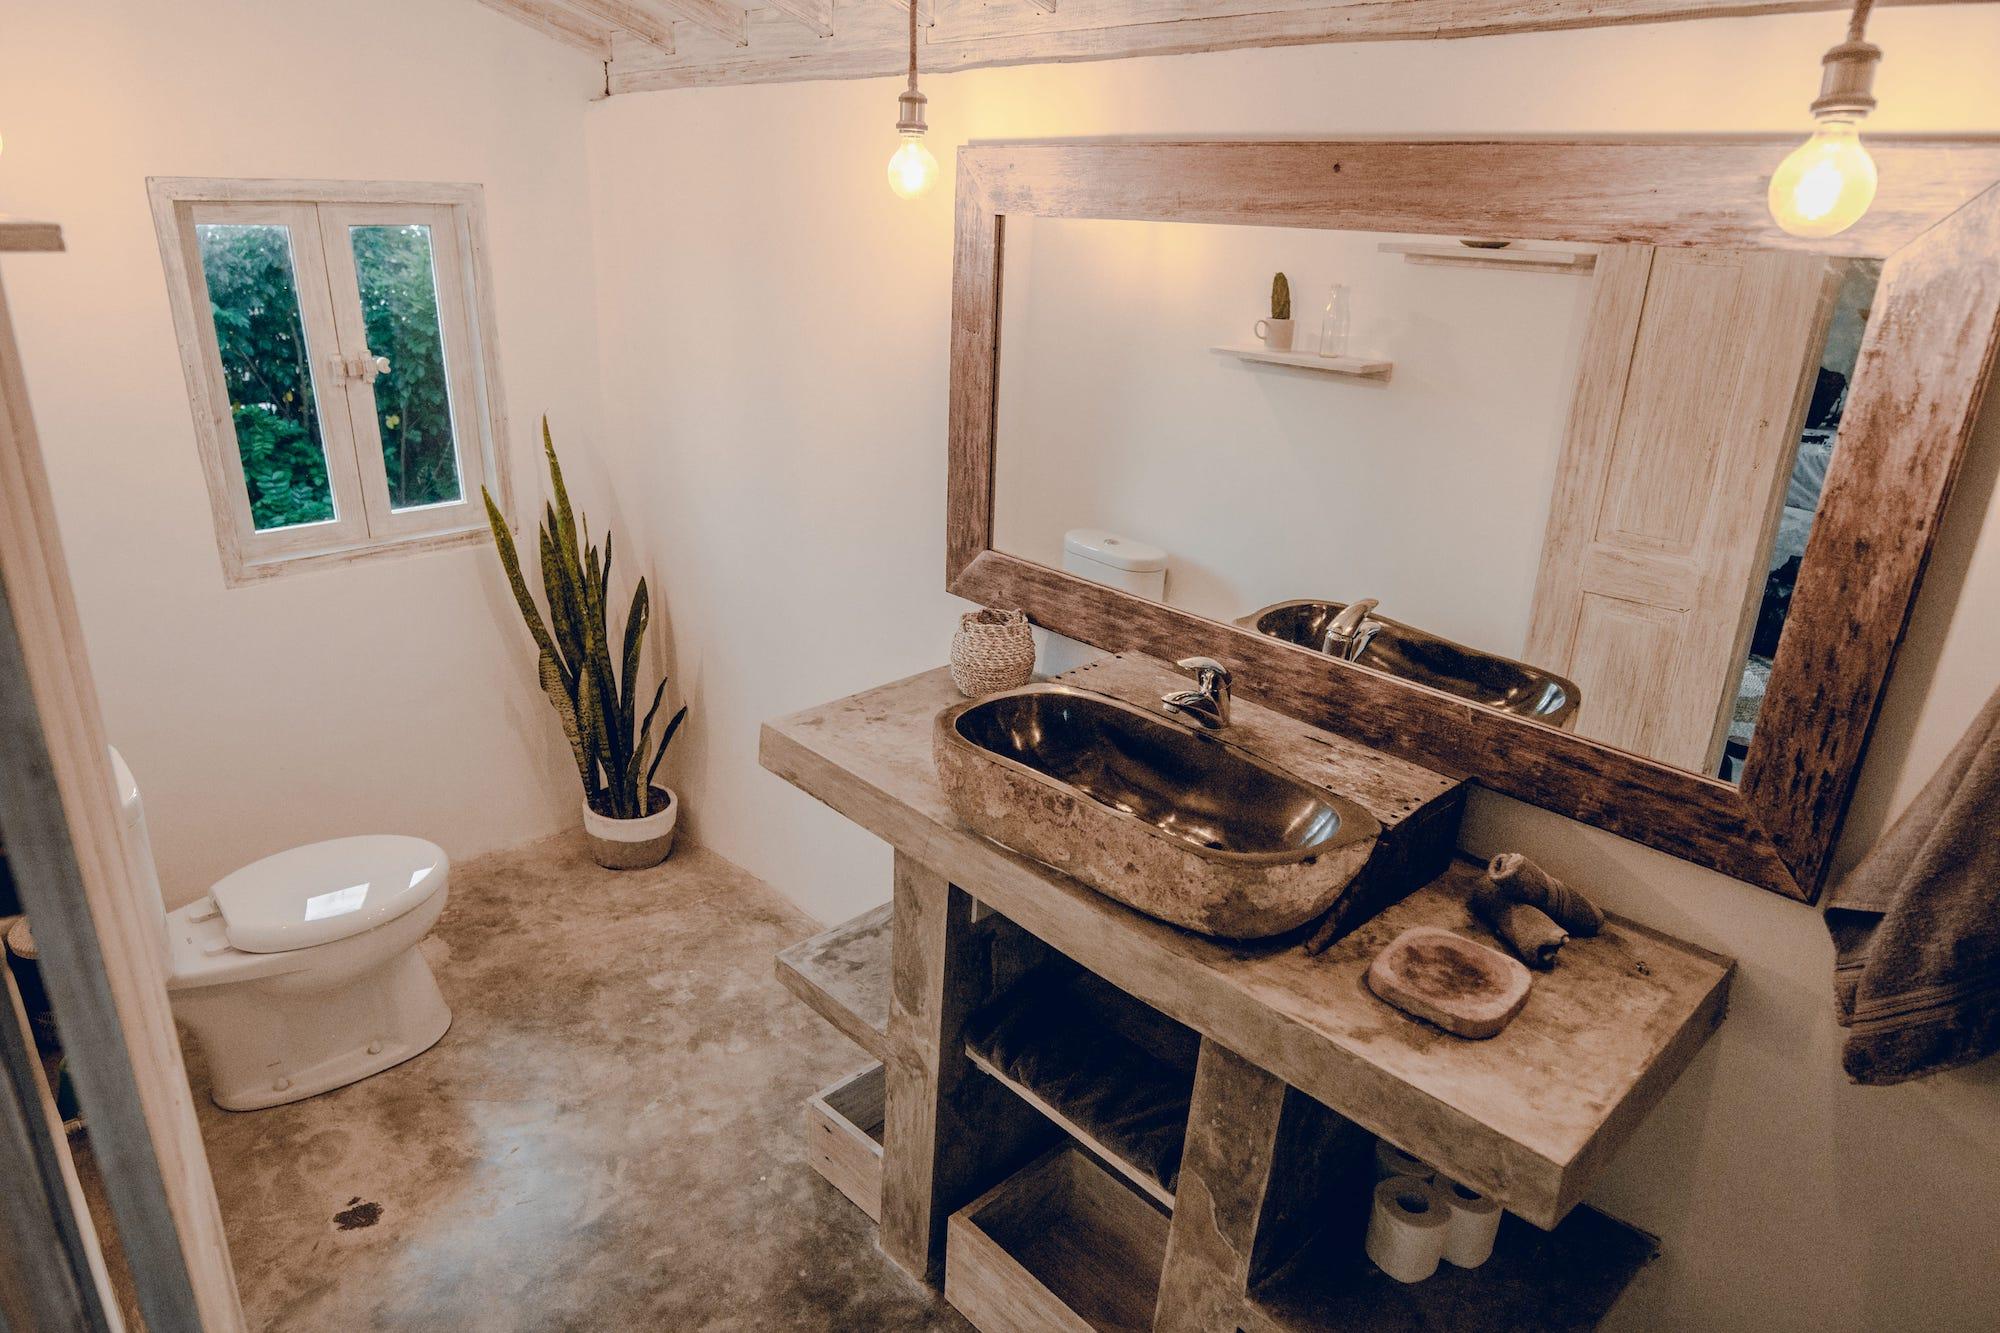 java house WC.jpg